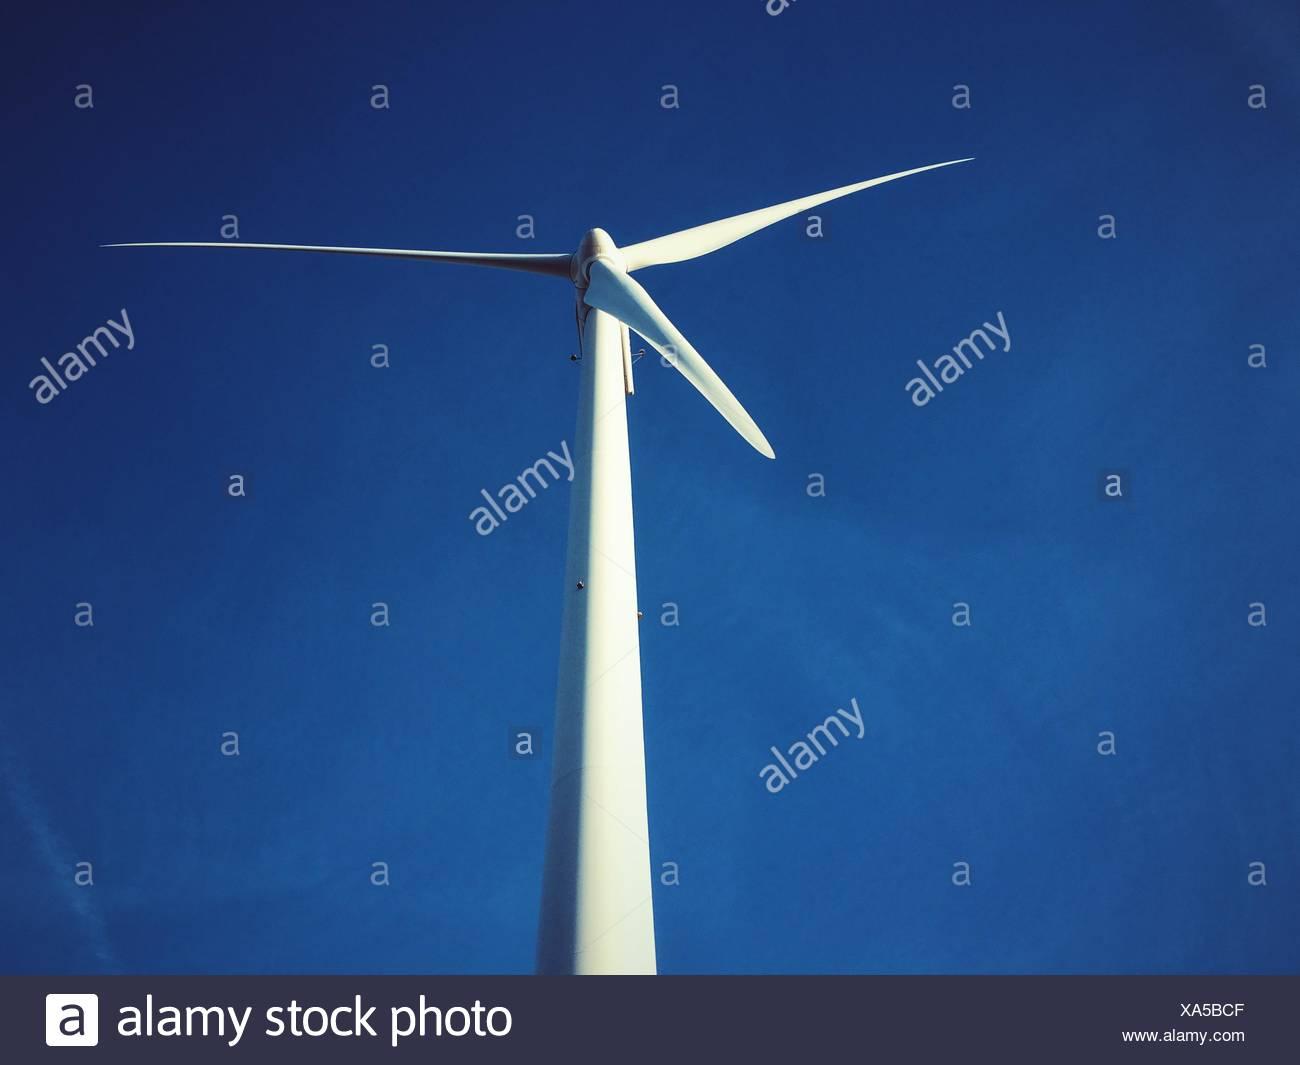 Niedrige Angle View Of Windturbine gegen blauen Himmel Stockbild